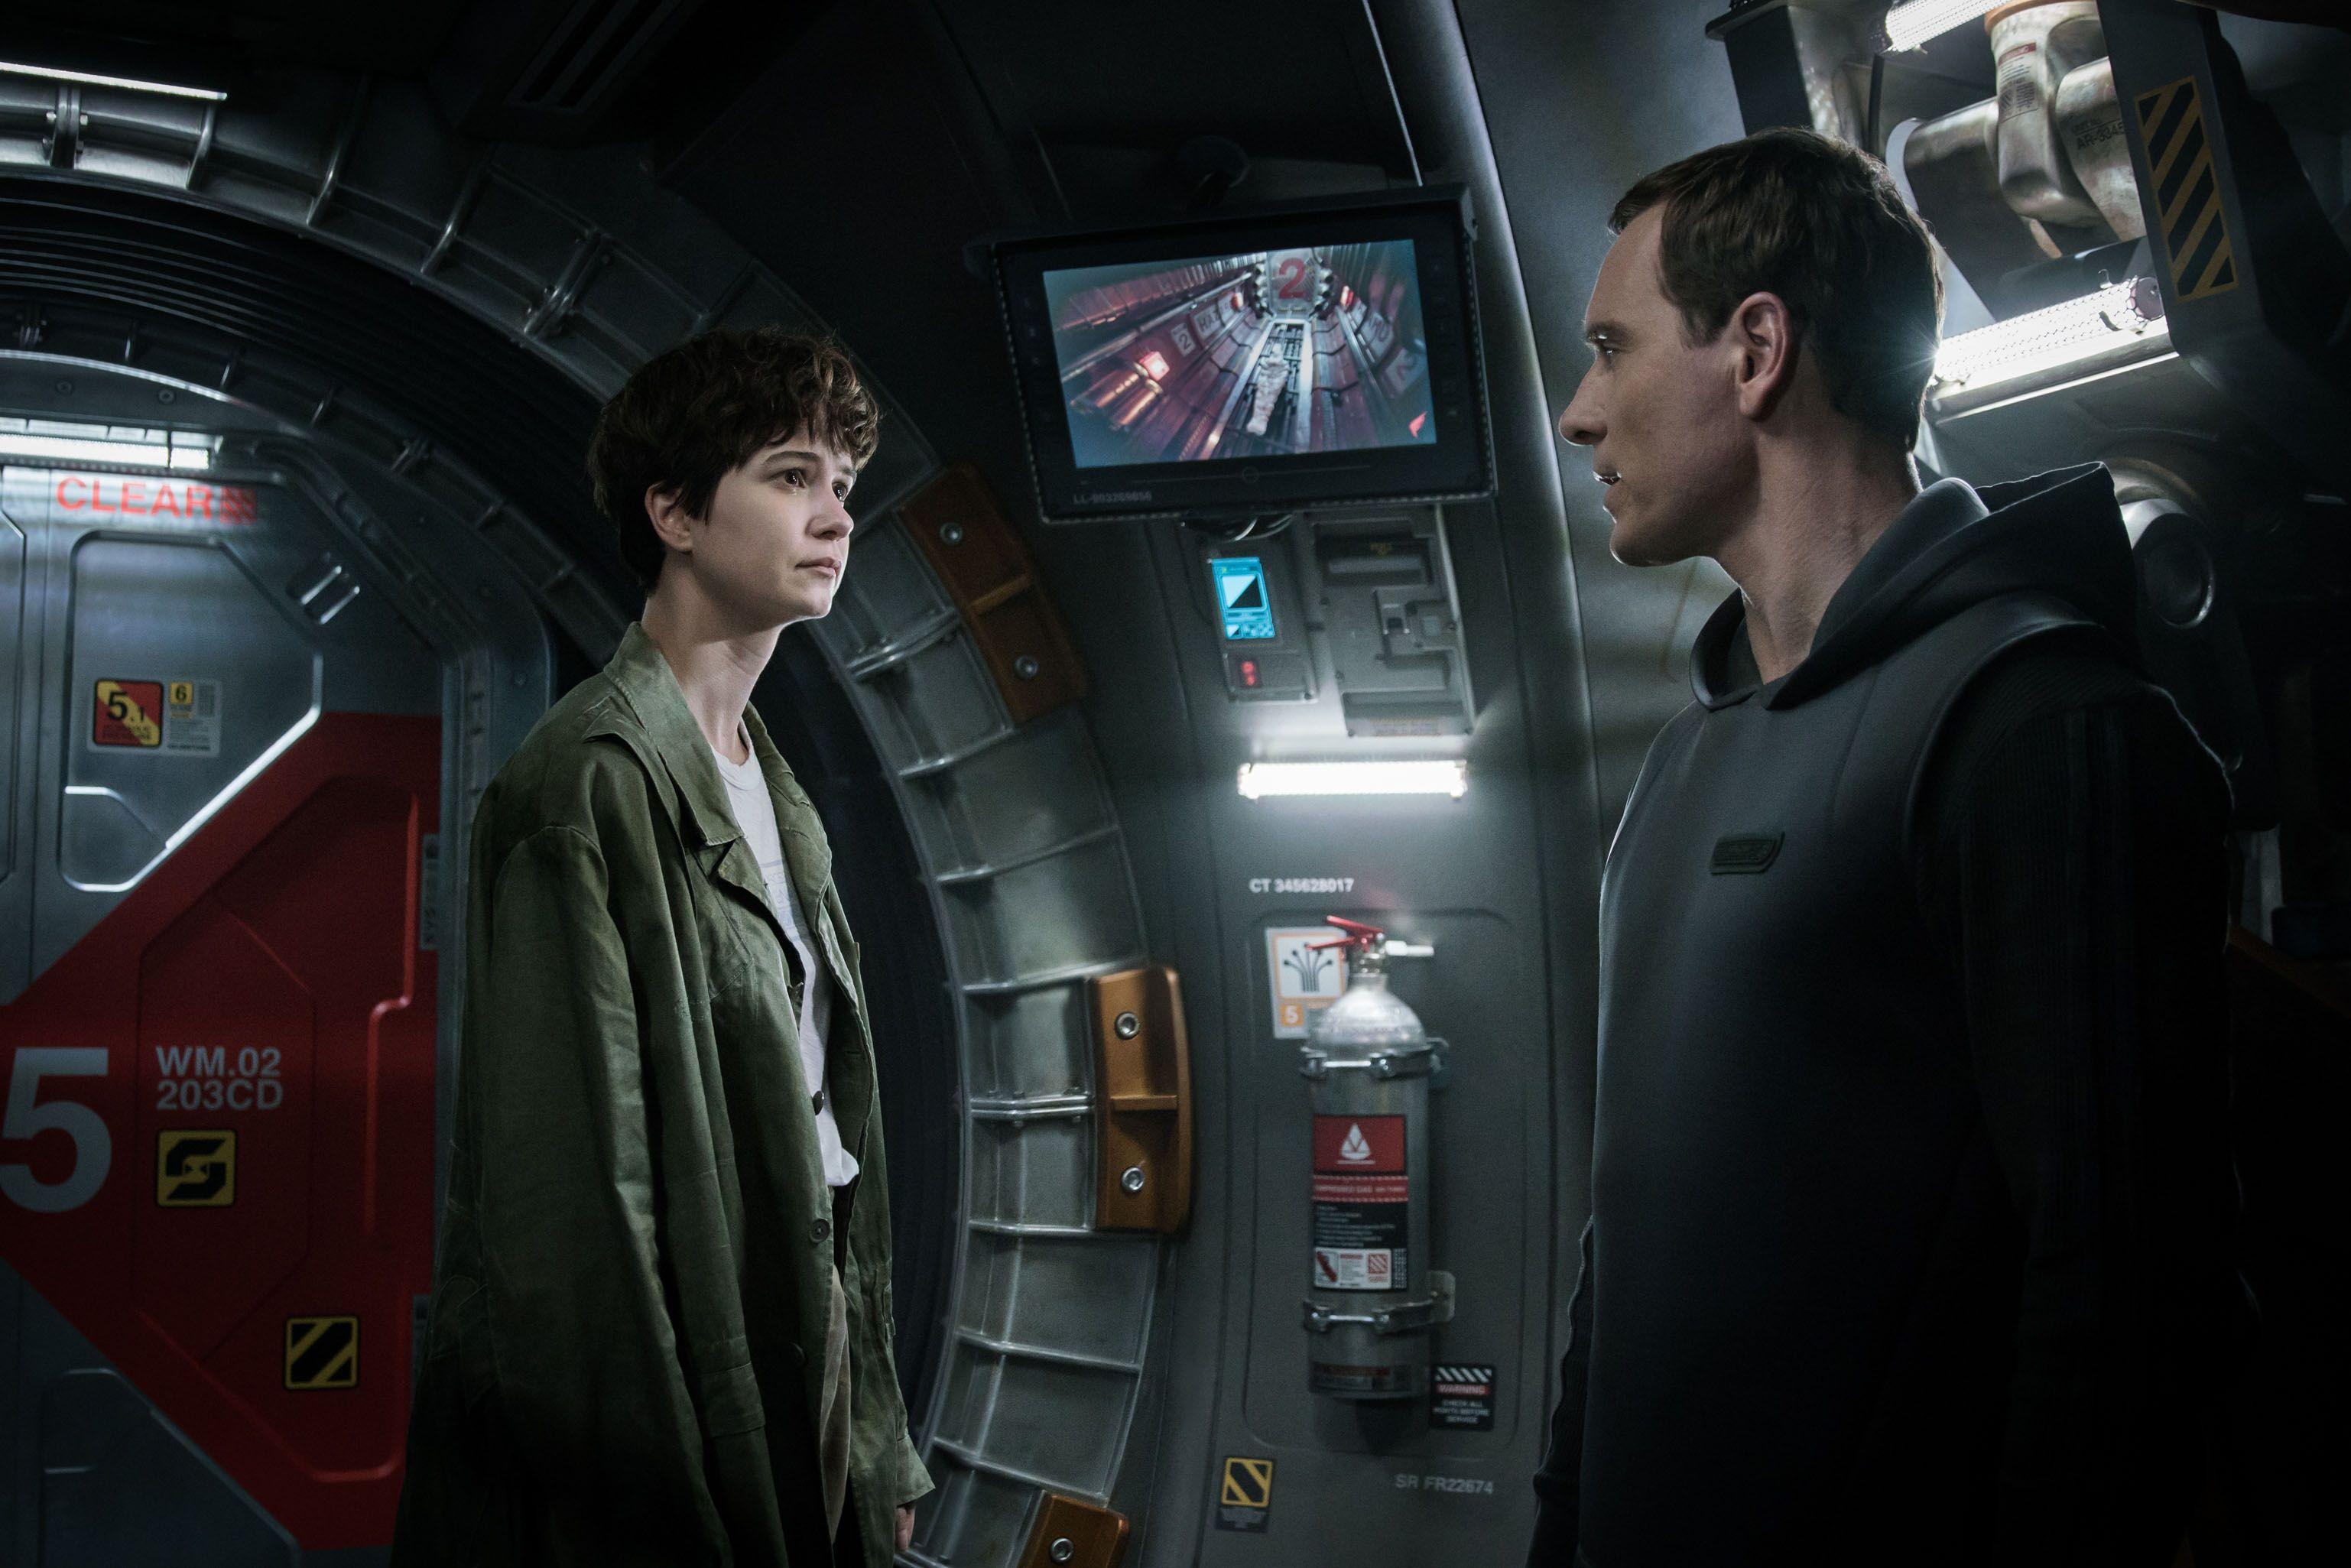 alien covenant 2 in flux as fox reassess franchise u0027s future